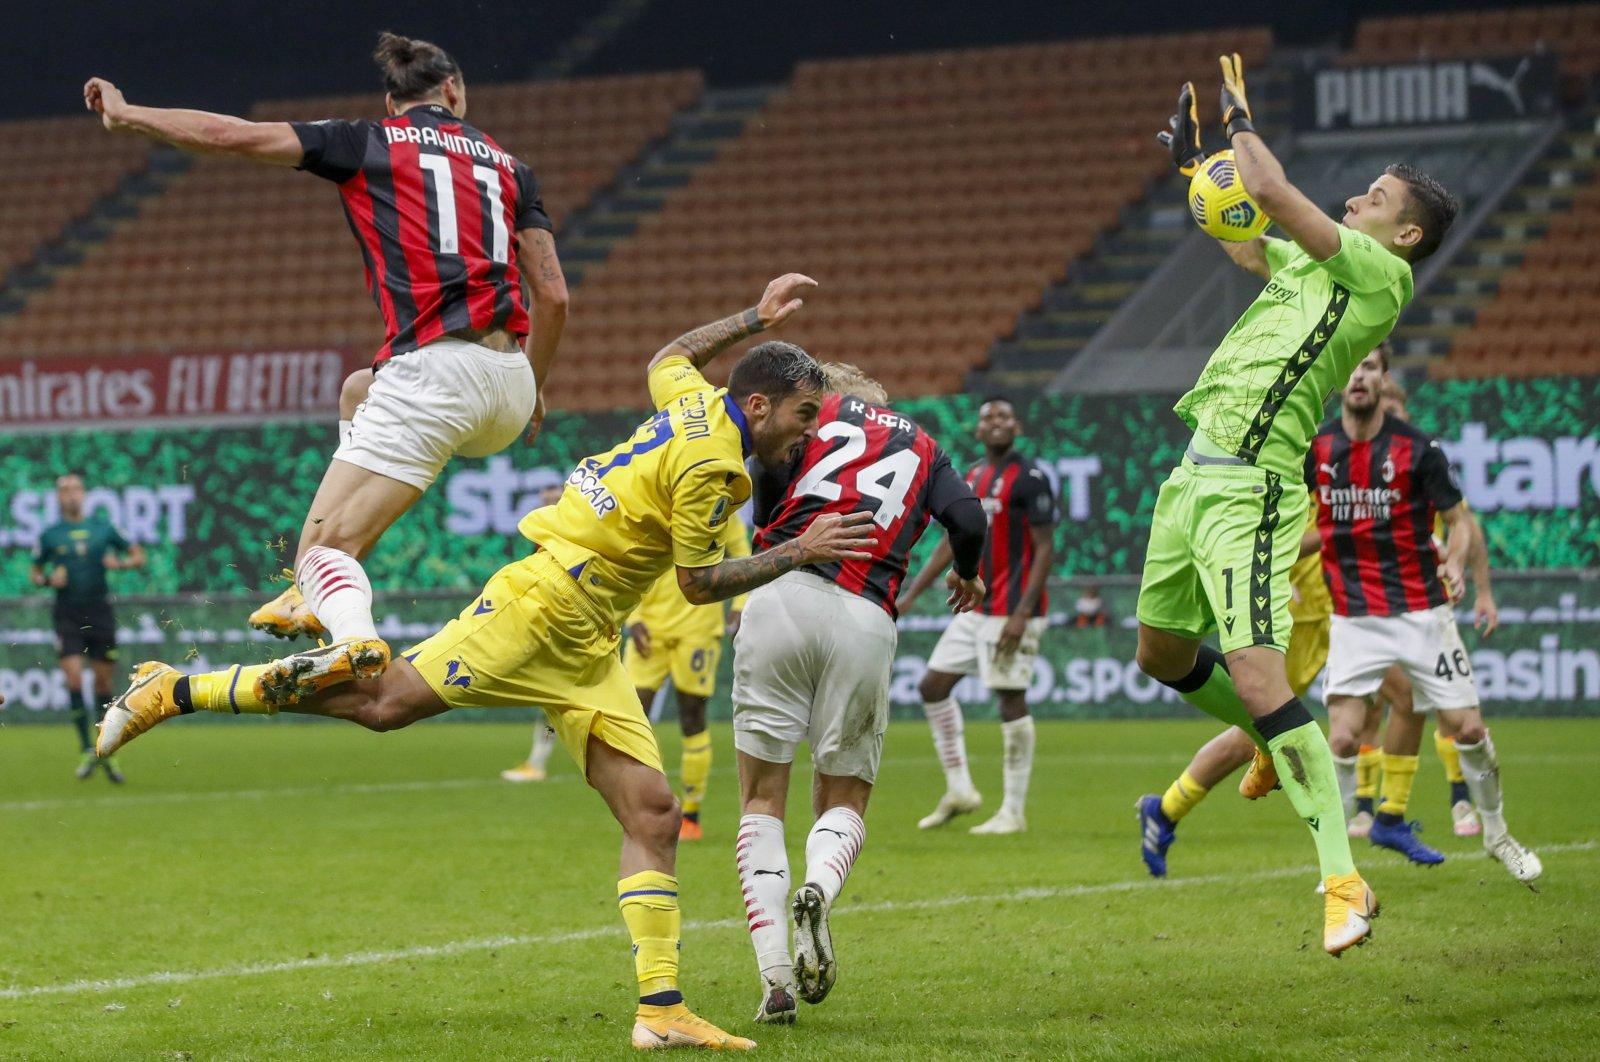 Verona's Marco Silvestri (R) saves as AC Milan's Zlatan Ibrahimovic (L) tries to score during a match, in Milan, Italy, Nov. 8, 2020. (AP Photo)